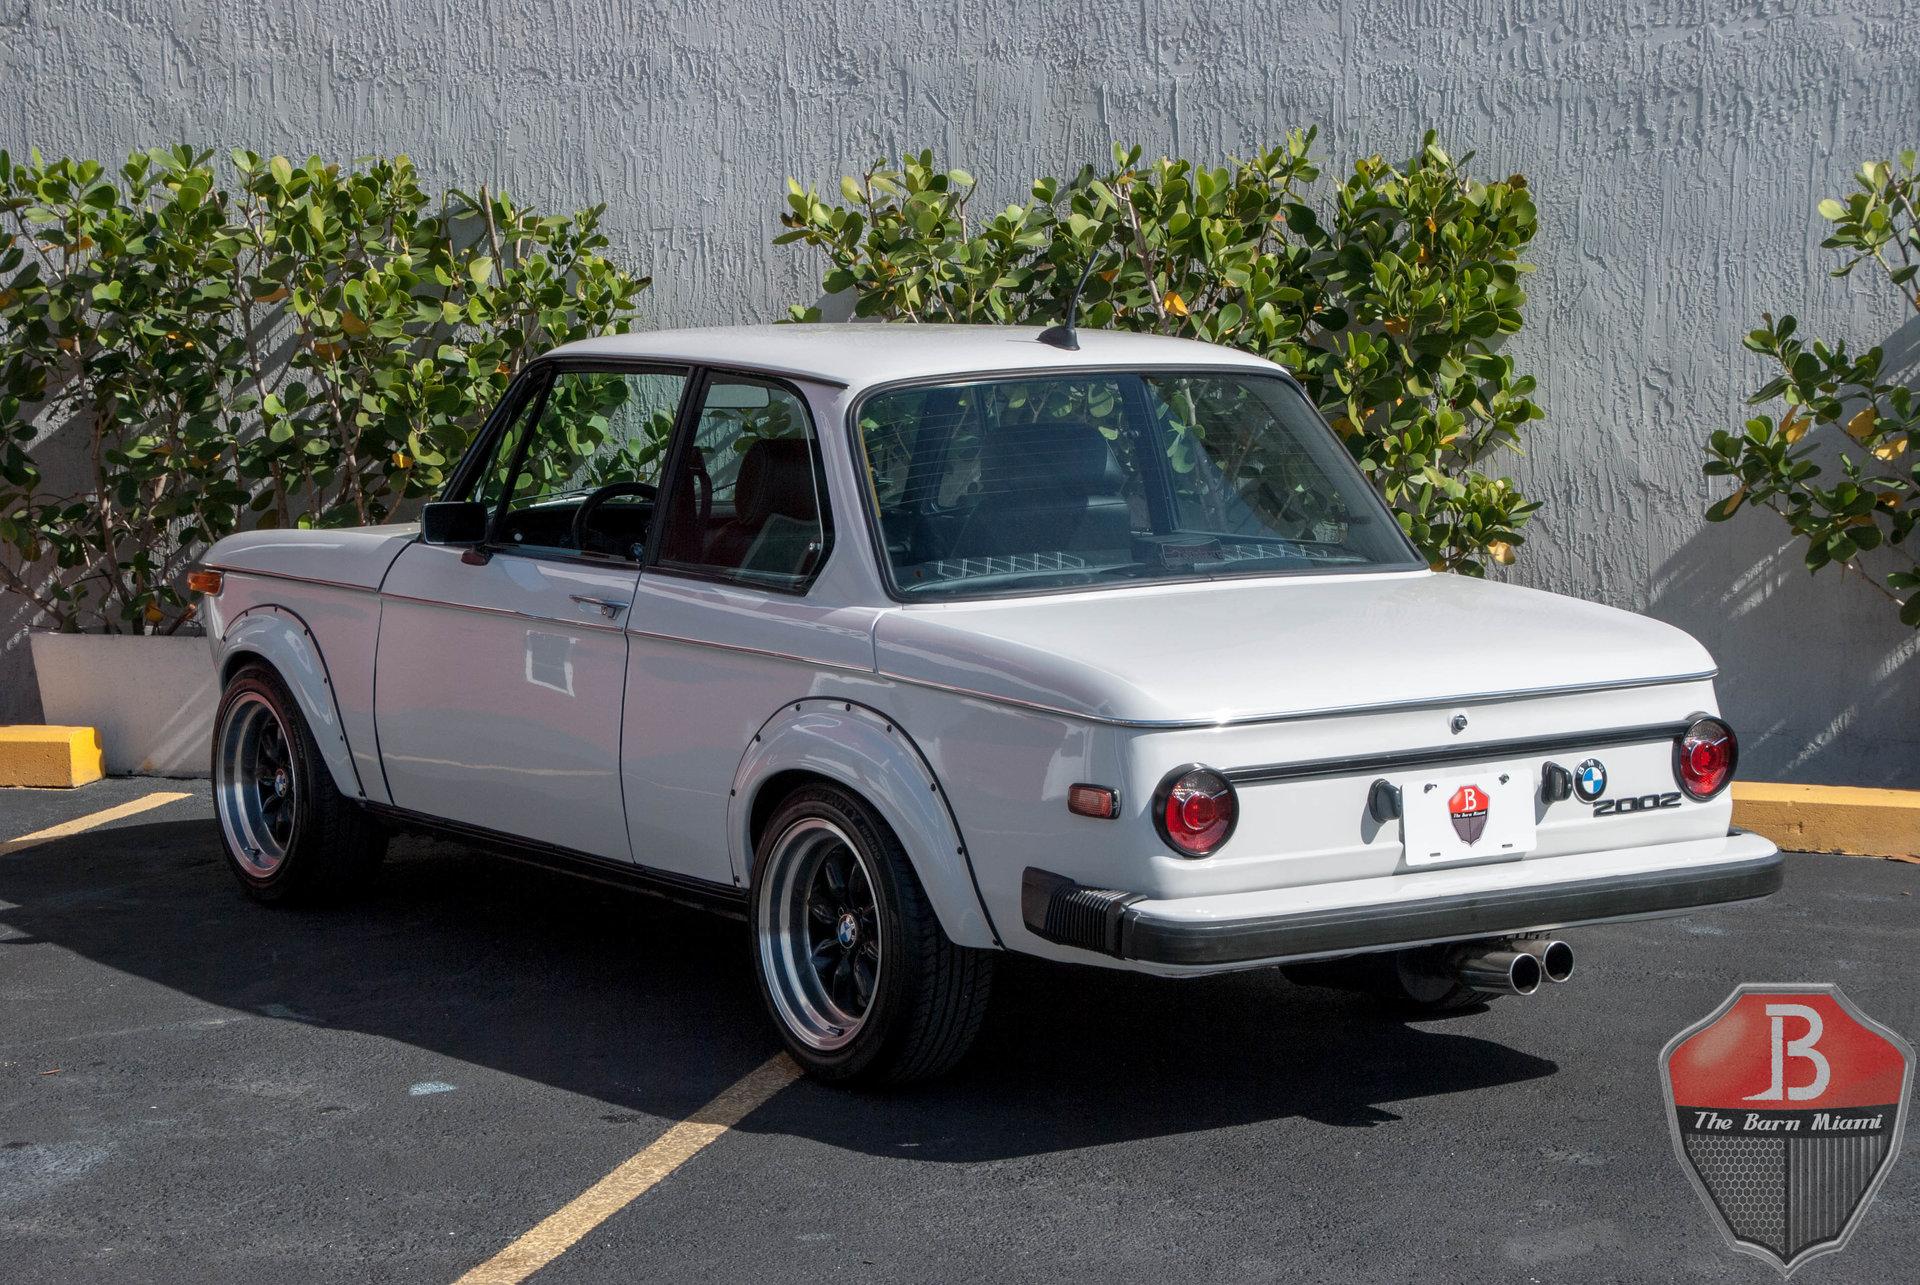 1973 BMW 2002 Alpina Turbo Look for sale #78238   MCG